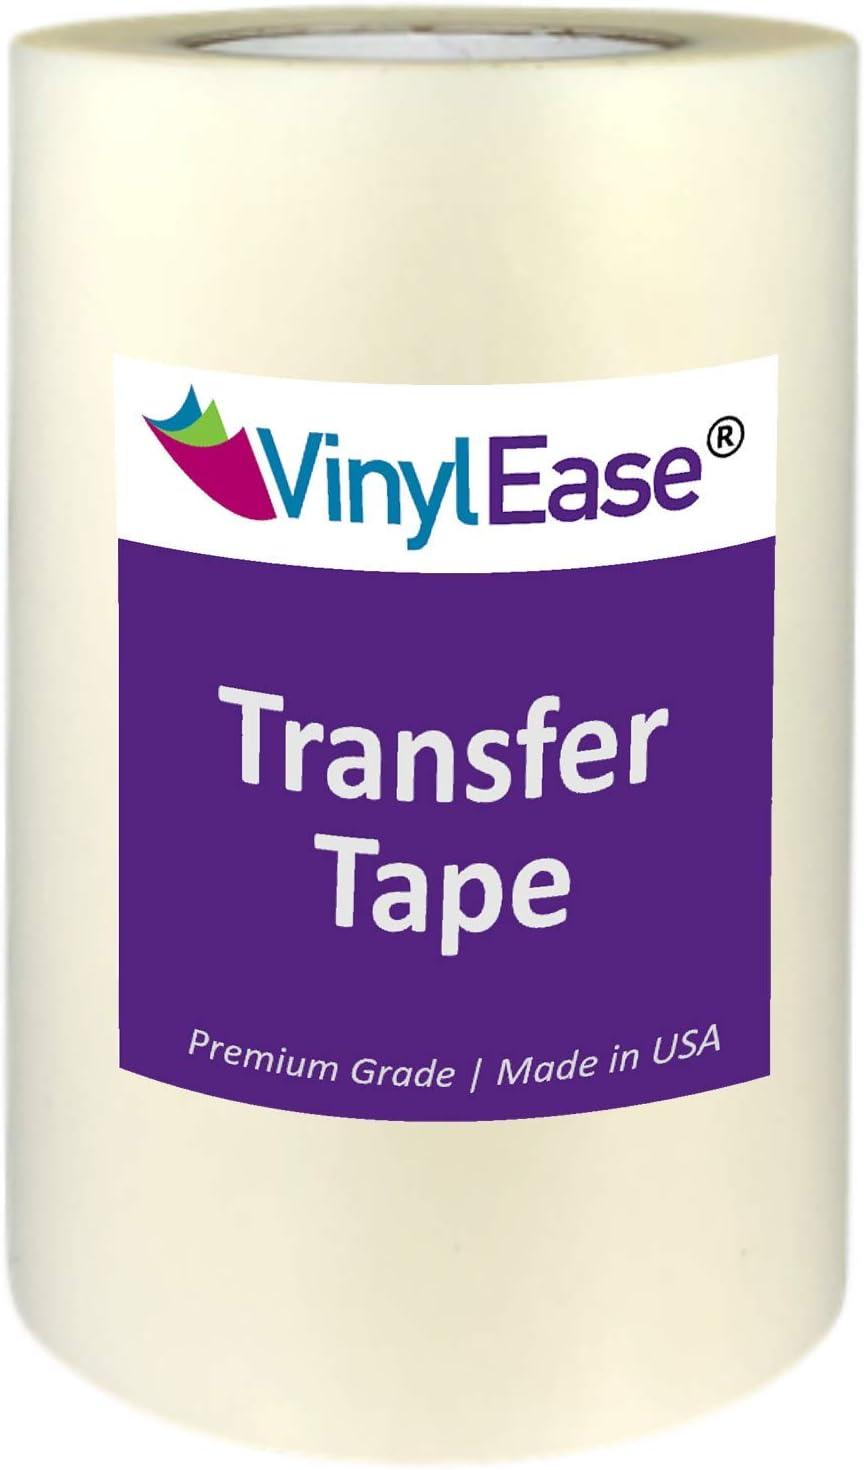 Craft Transfer 12 x 50 Feet Tape Roll Clear Lay Flat Application Vinyl Signs